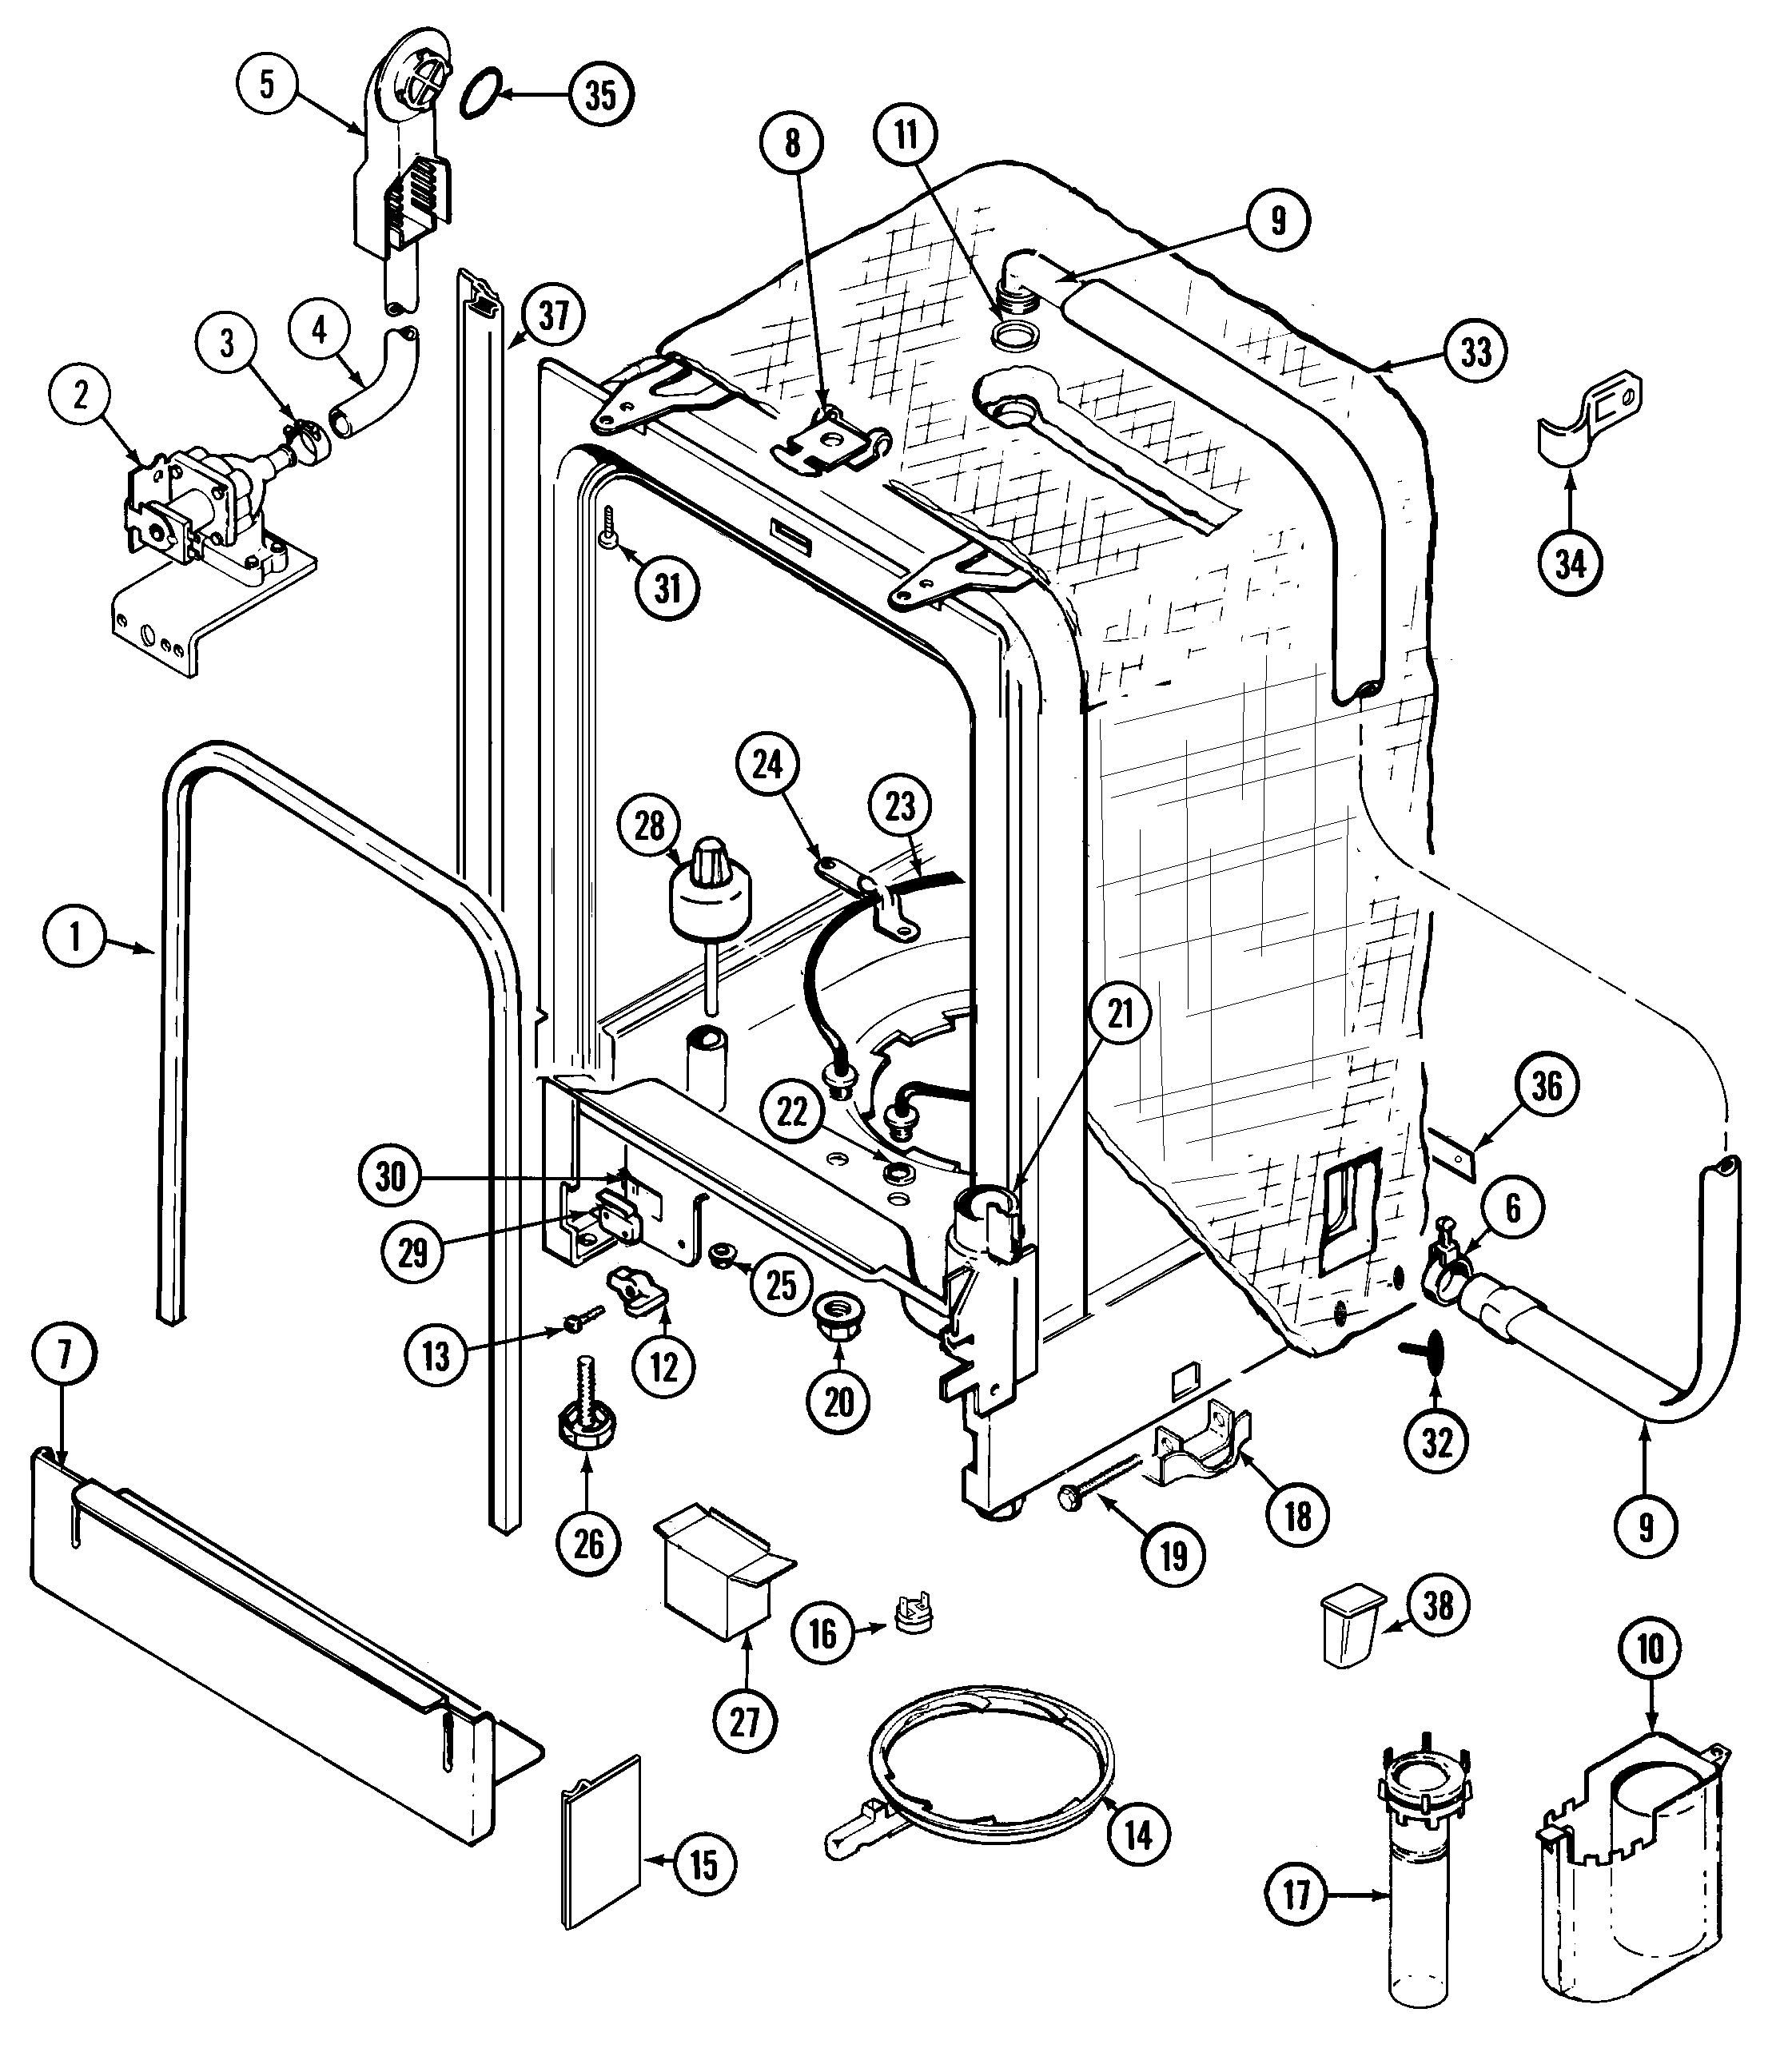 Asko Dishwasher Parts Diagram Wiring Diagram for asko Dishwasher